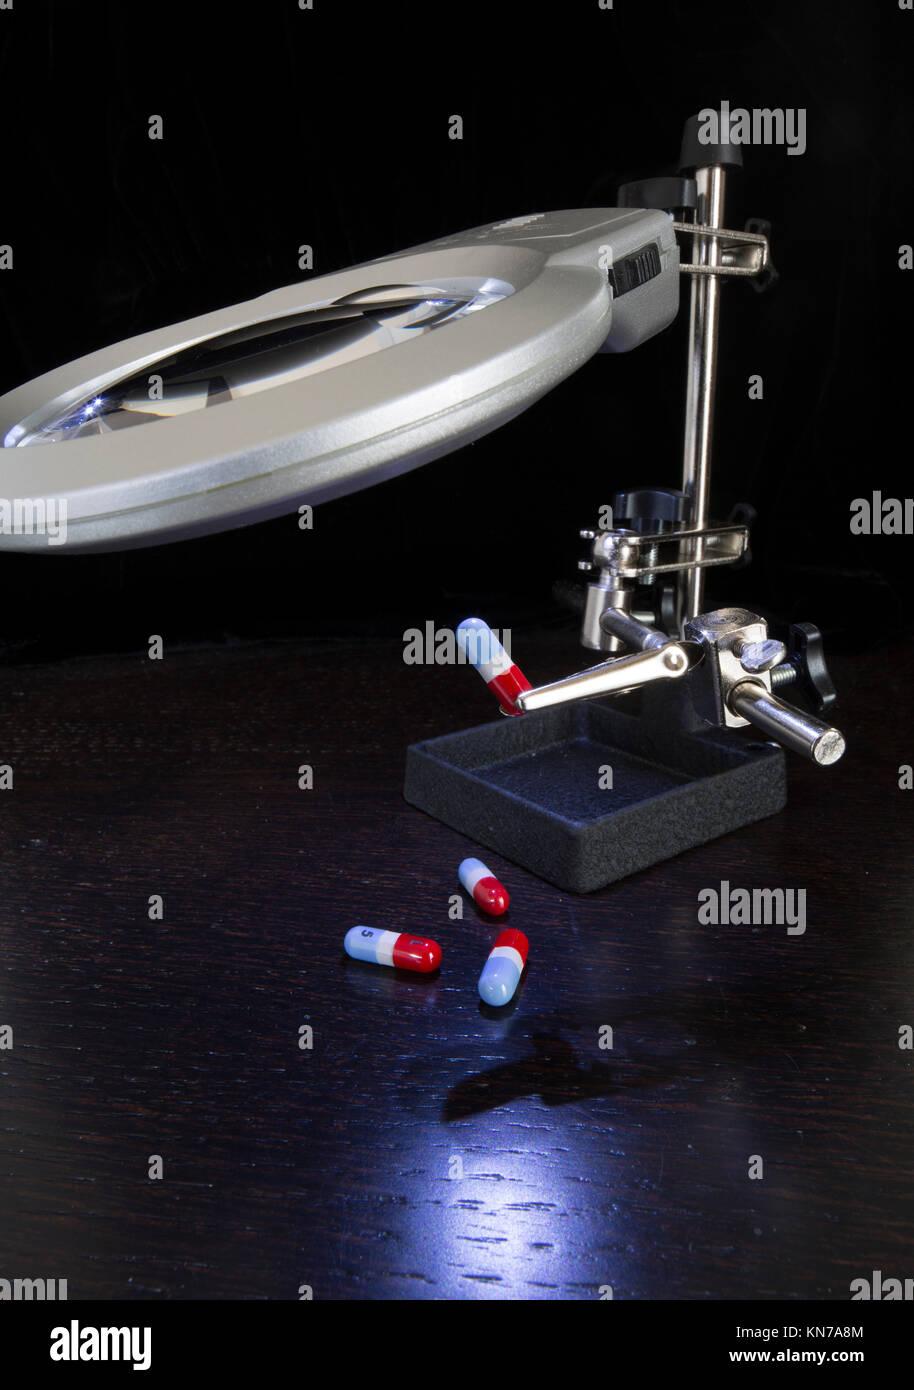 Präzision Lupe mit LED-Handlampe Inspektion Medikation Kapseln Stockbild